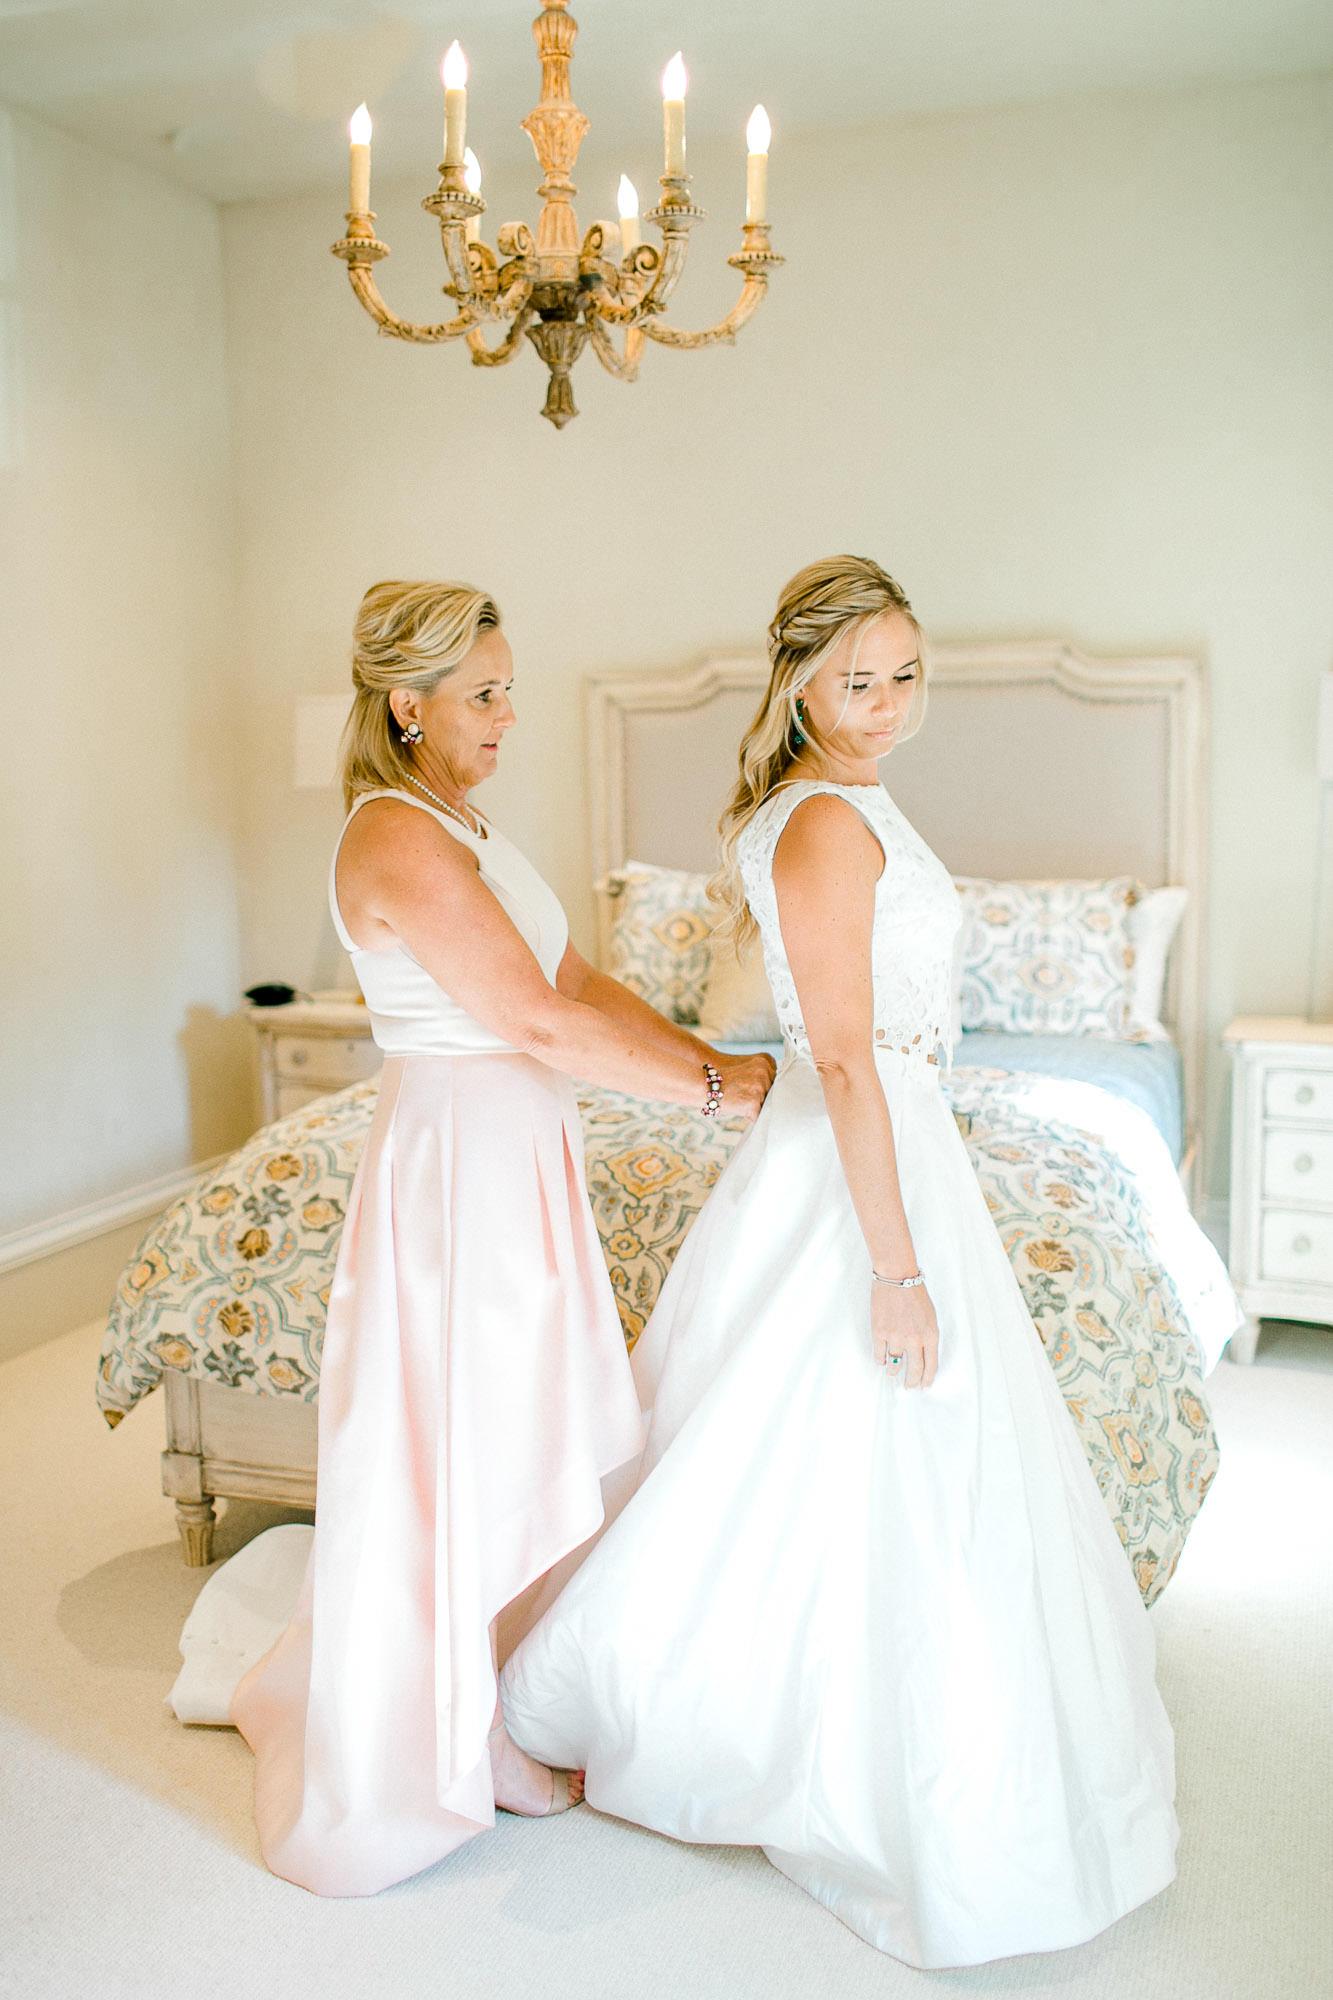 ali-brandon-hamilton-lubbock-wedding-photographer-estate-lee-lewis-construction-bee-alleej_0014.jpg